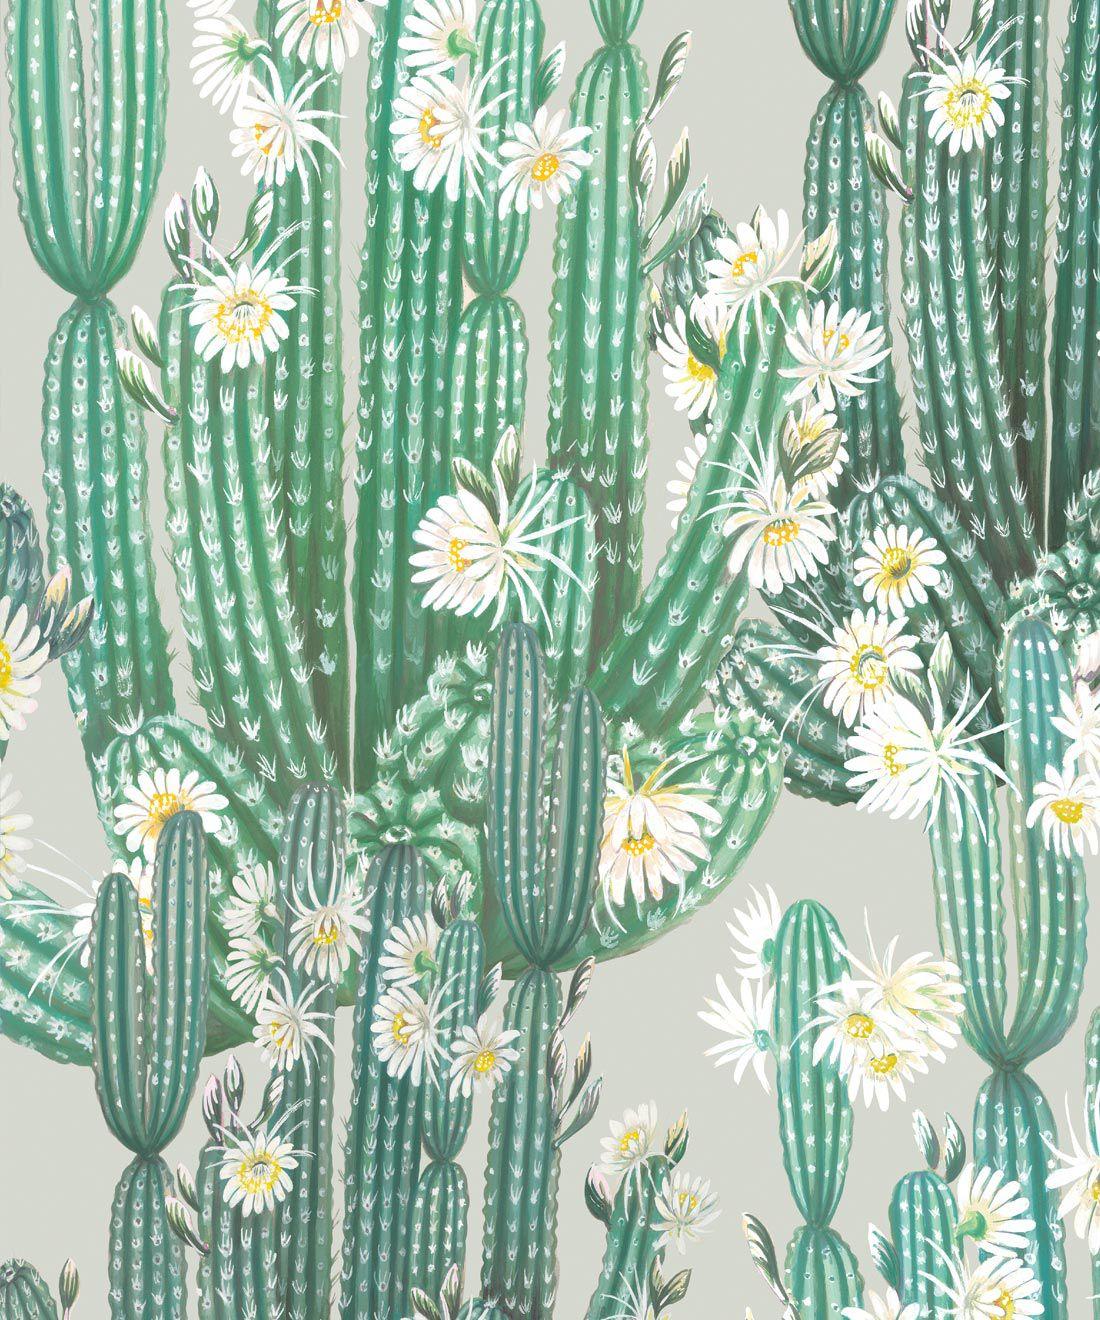 San Pedro Wallpaper Green • Cactus Wallpaper • Succulents Wallpaper • Desert Wallpaper Swatch